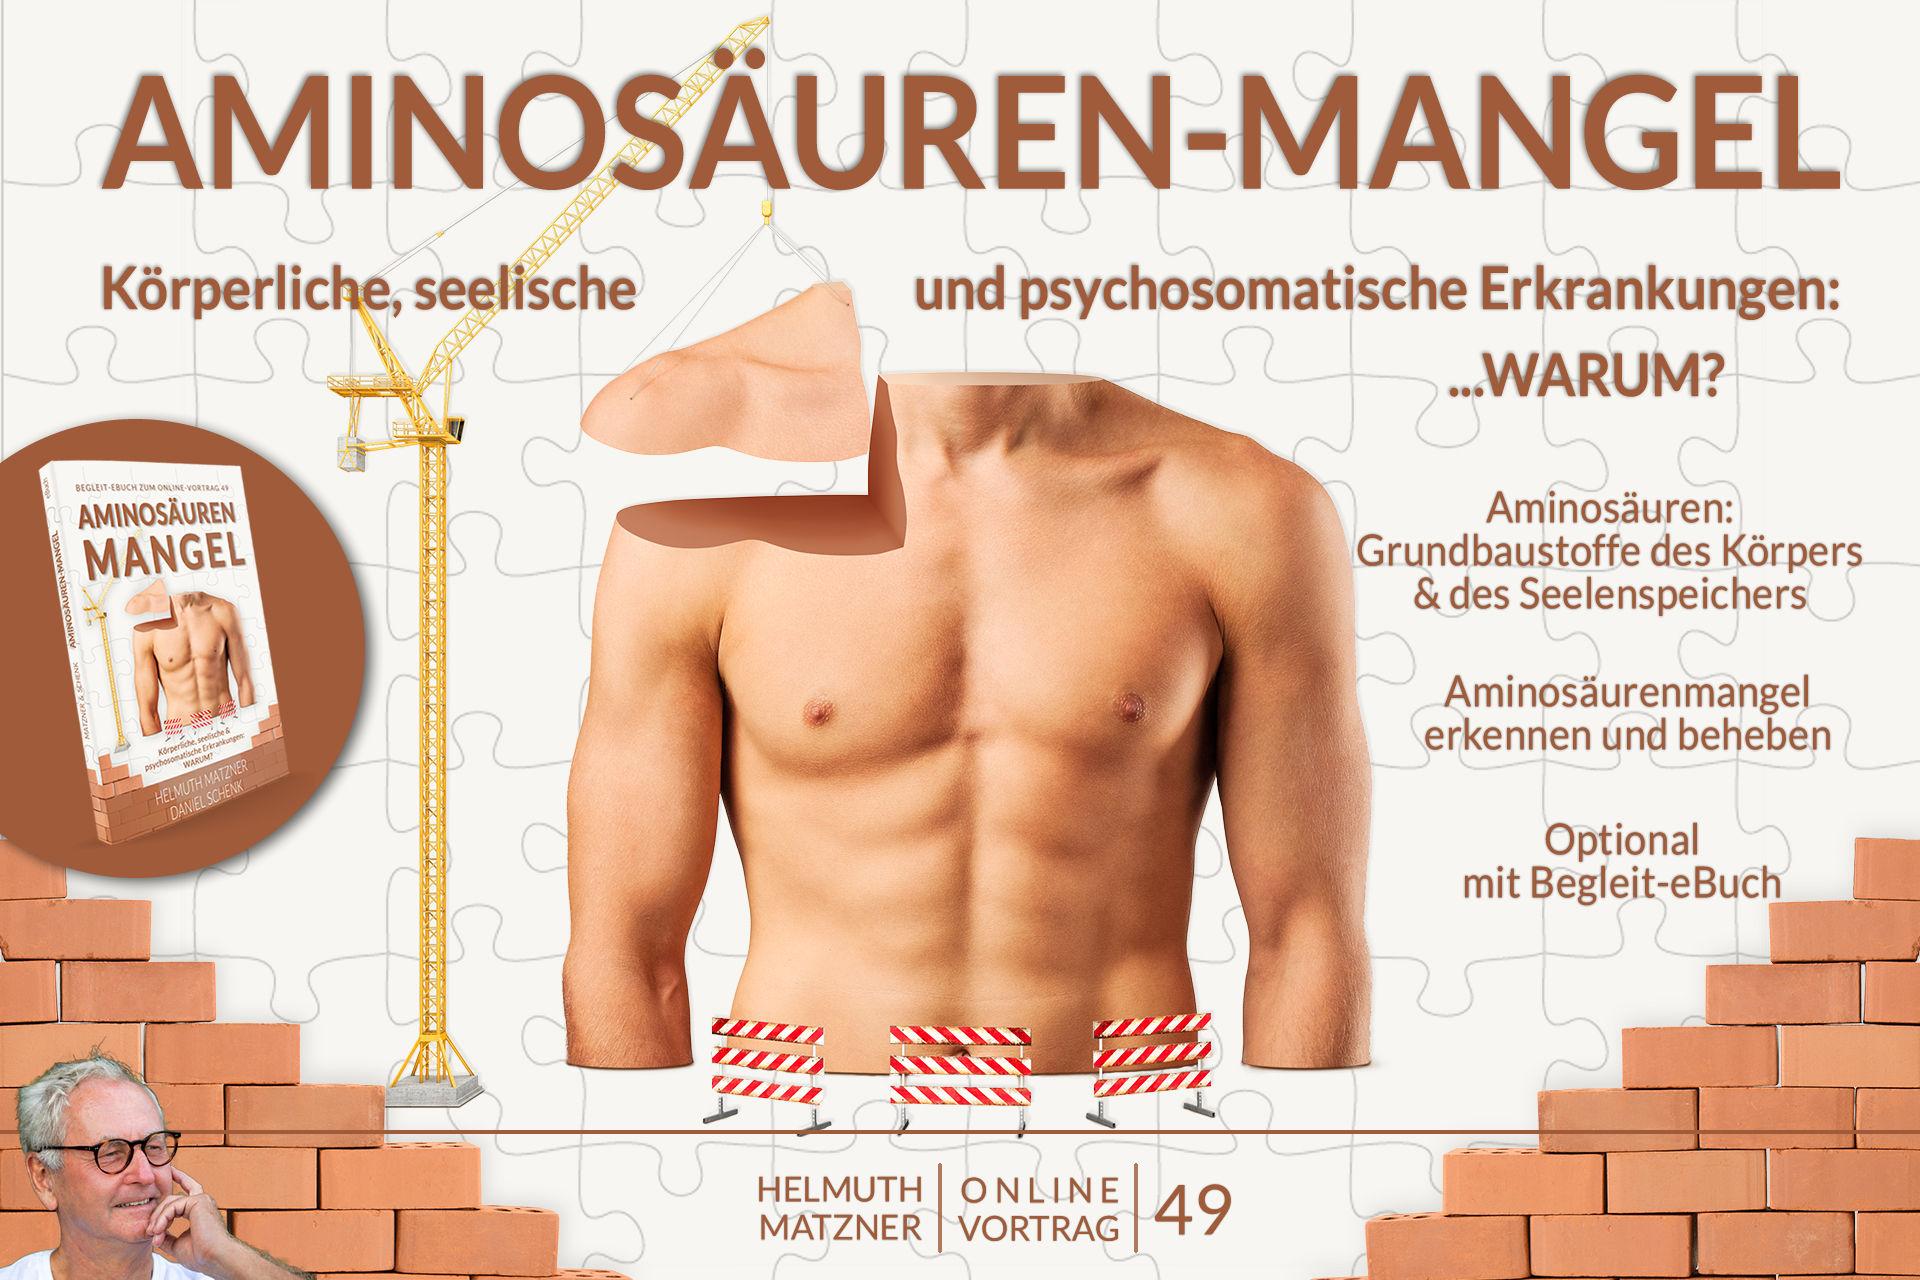 Helmuth Matzner - Online-Vortrag 49 - Aminosäurenmangel - Archiv - v05